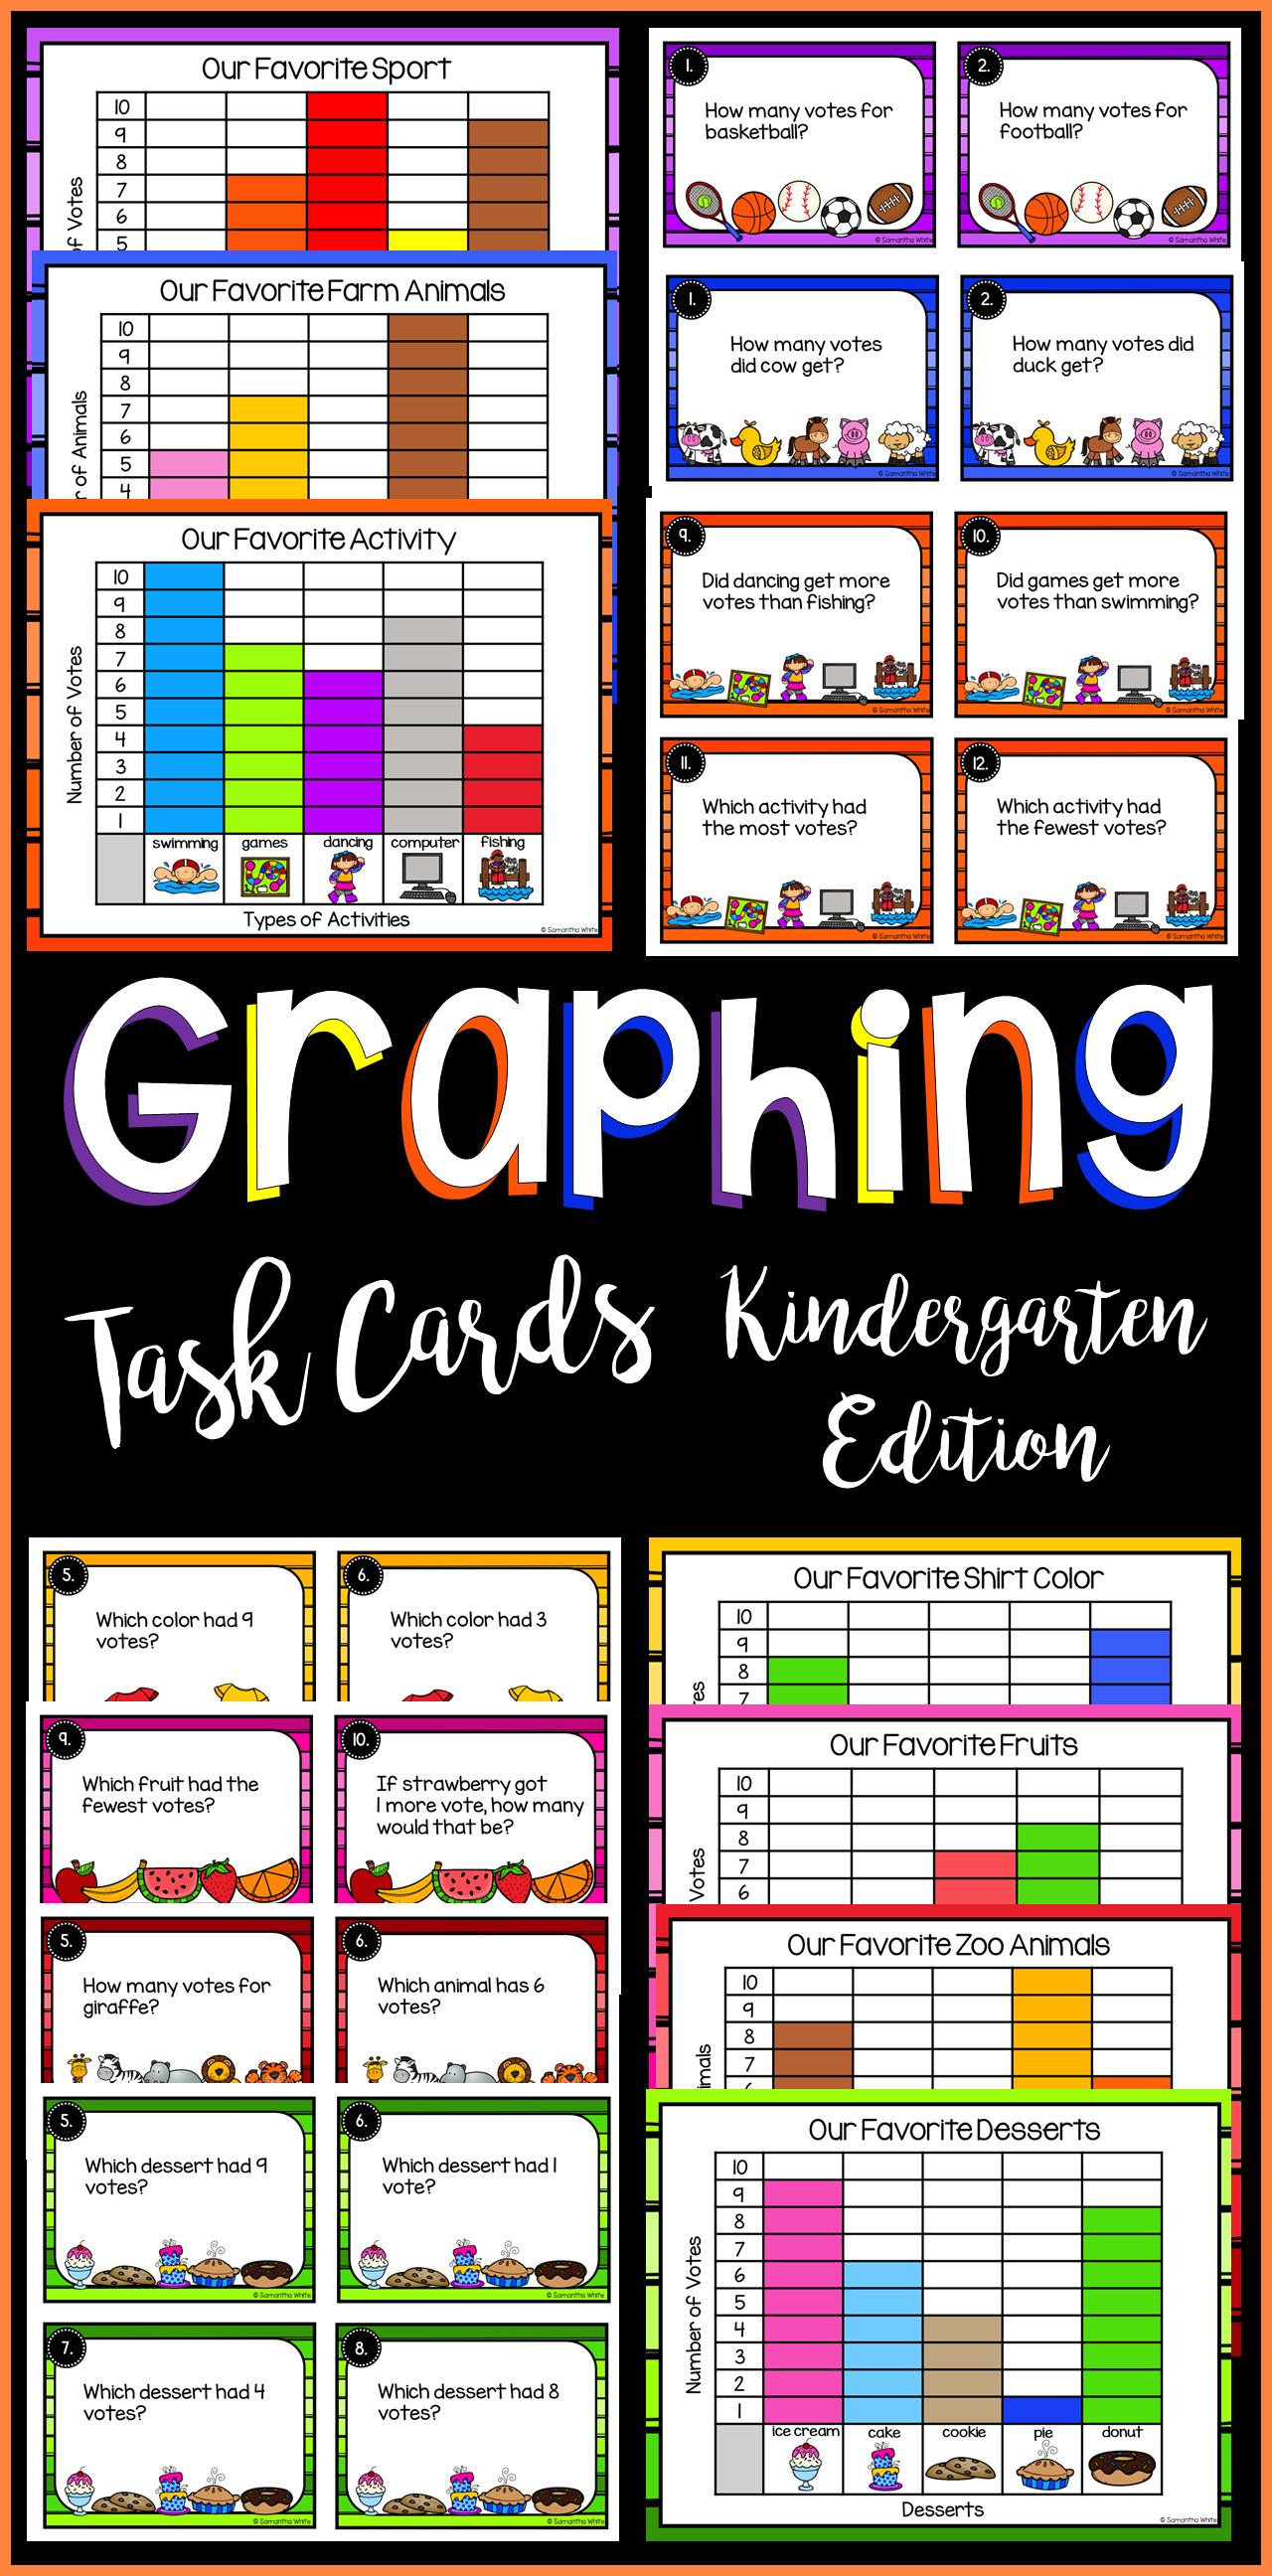 Graphing Task Cards Kindergarten Edition